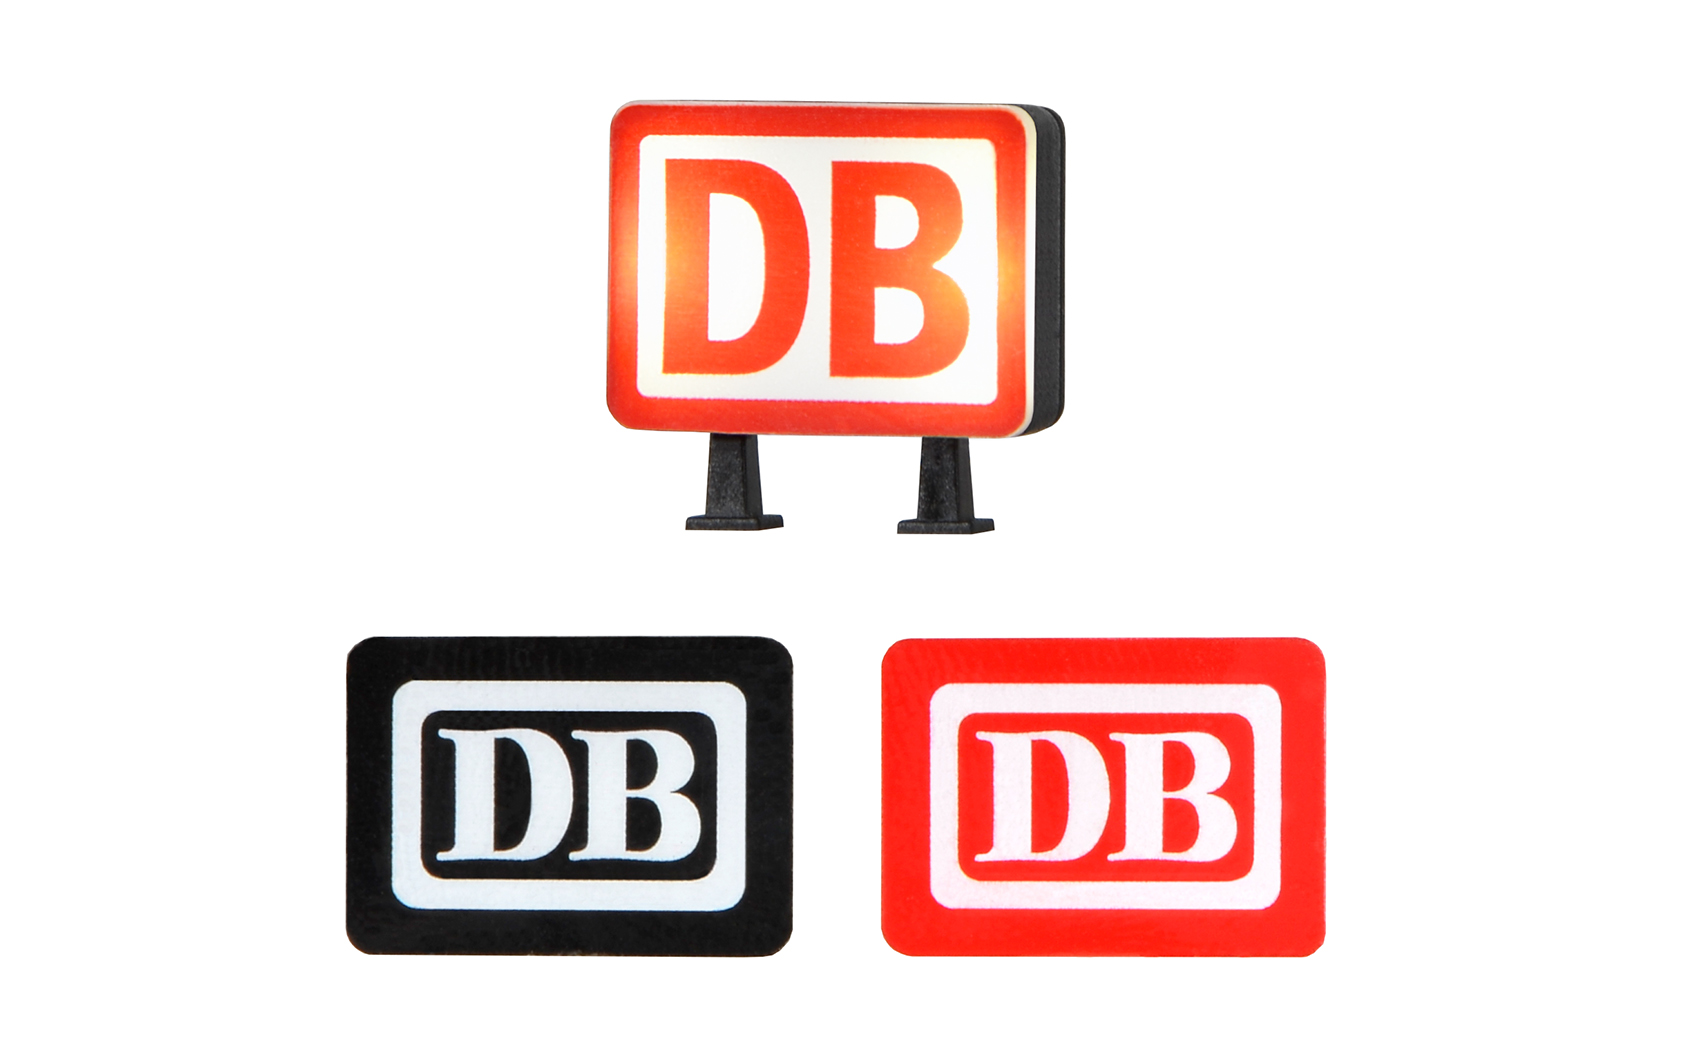 Viessmann 5075 <br/>DB Keks mit LED Beleuchtung, weiß